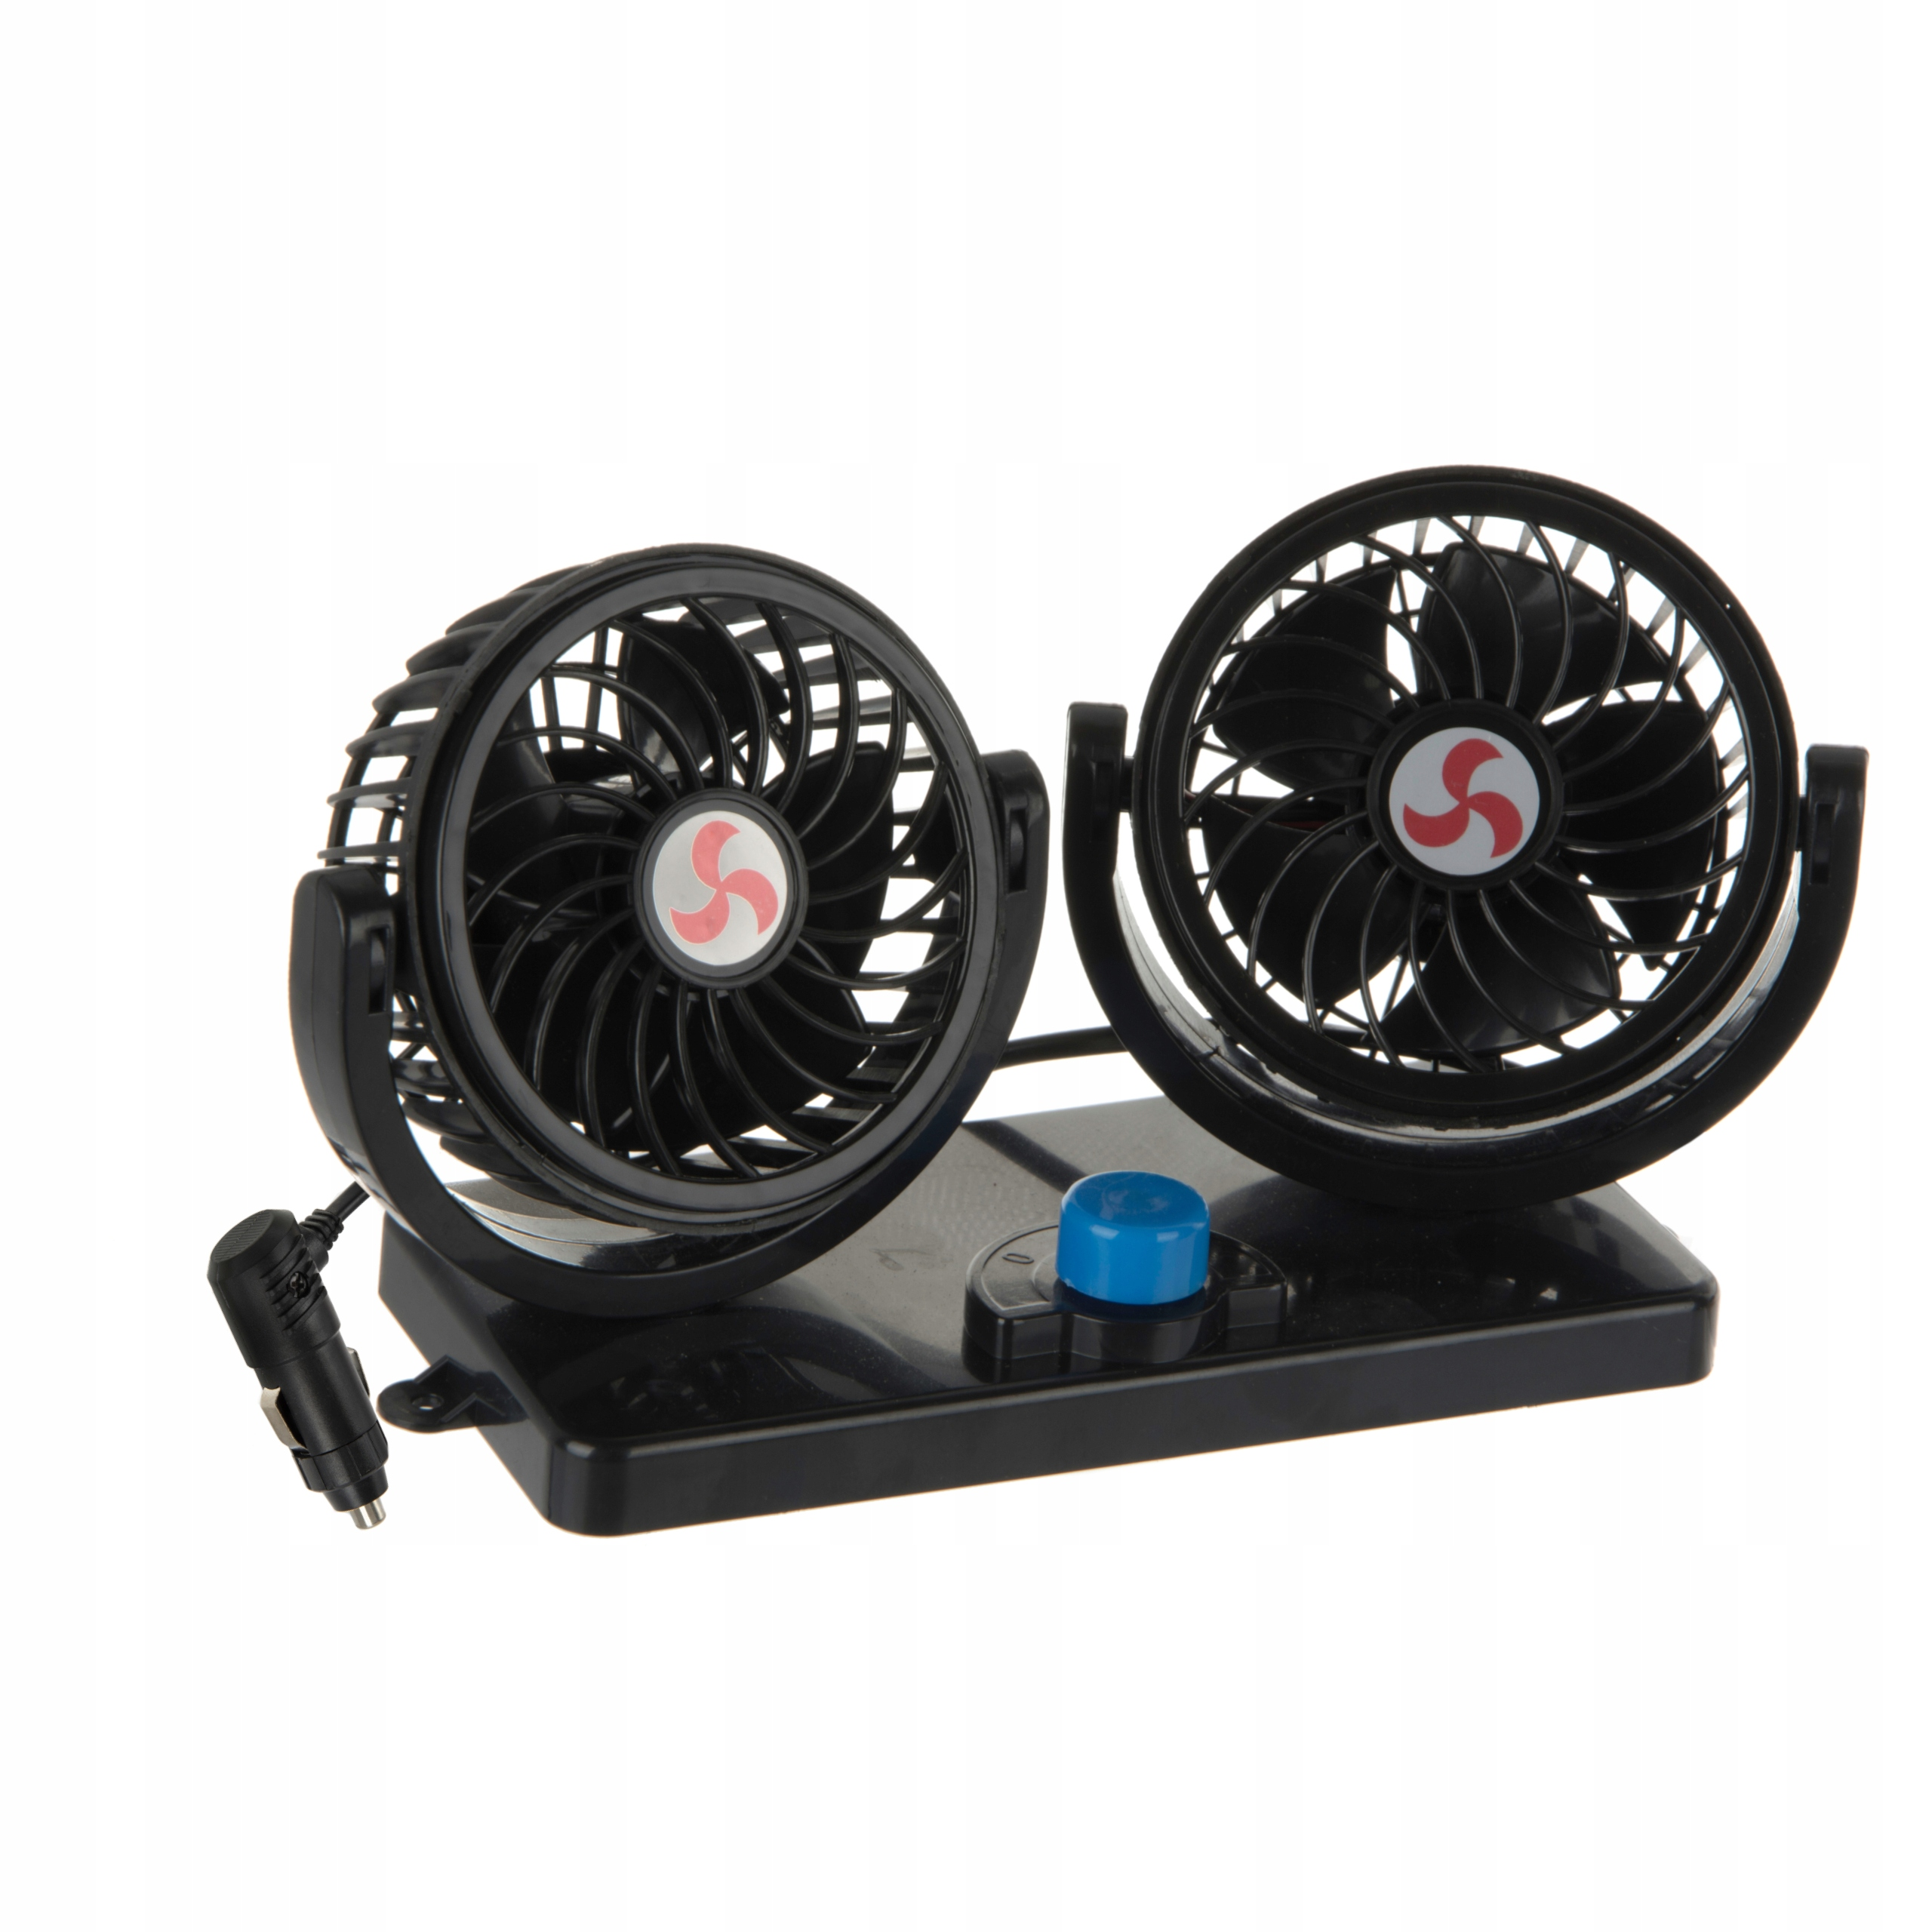 Вентилятор охлаждения мельница 12V 13W